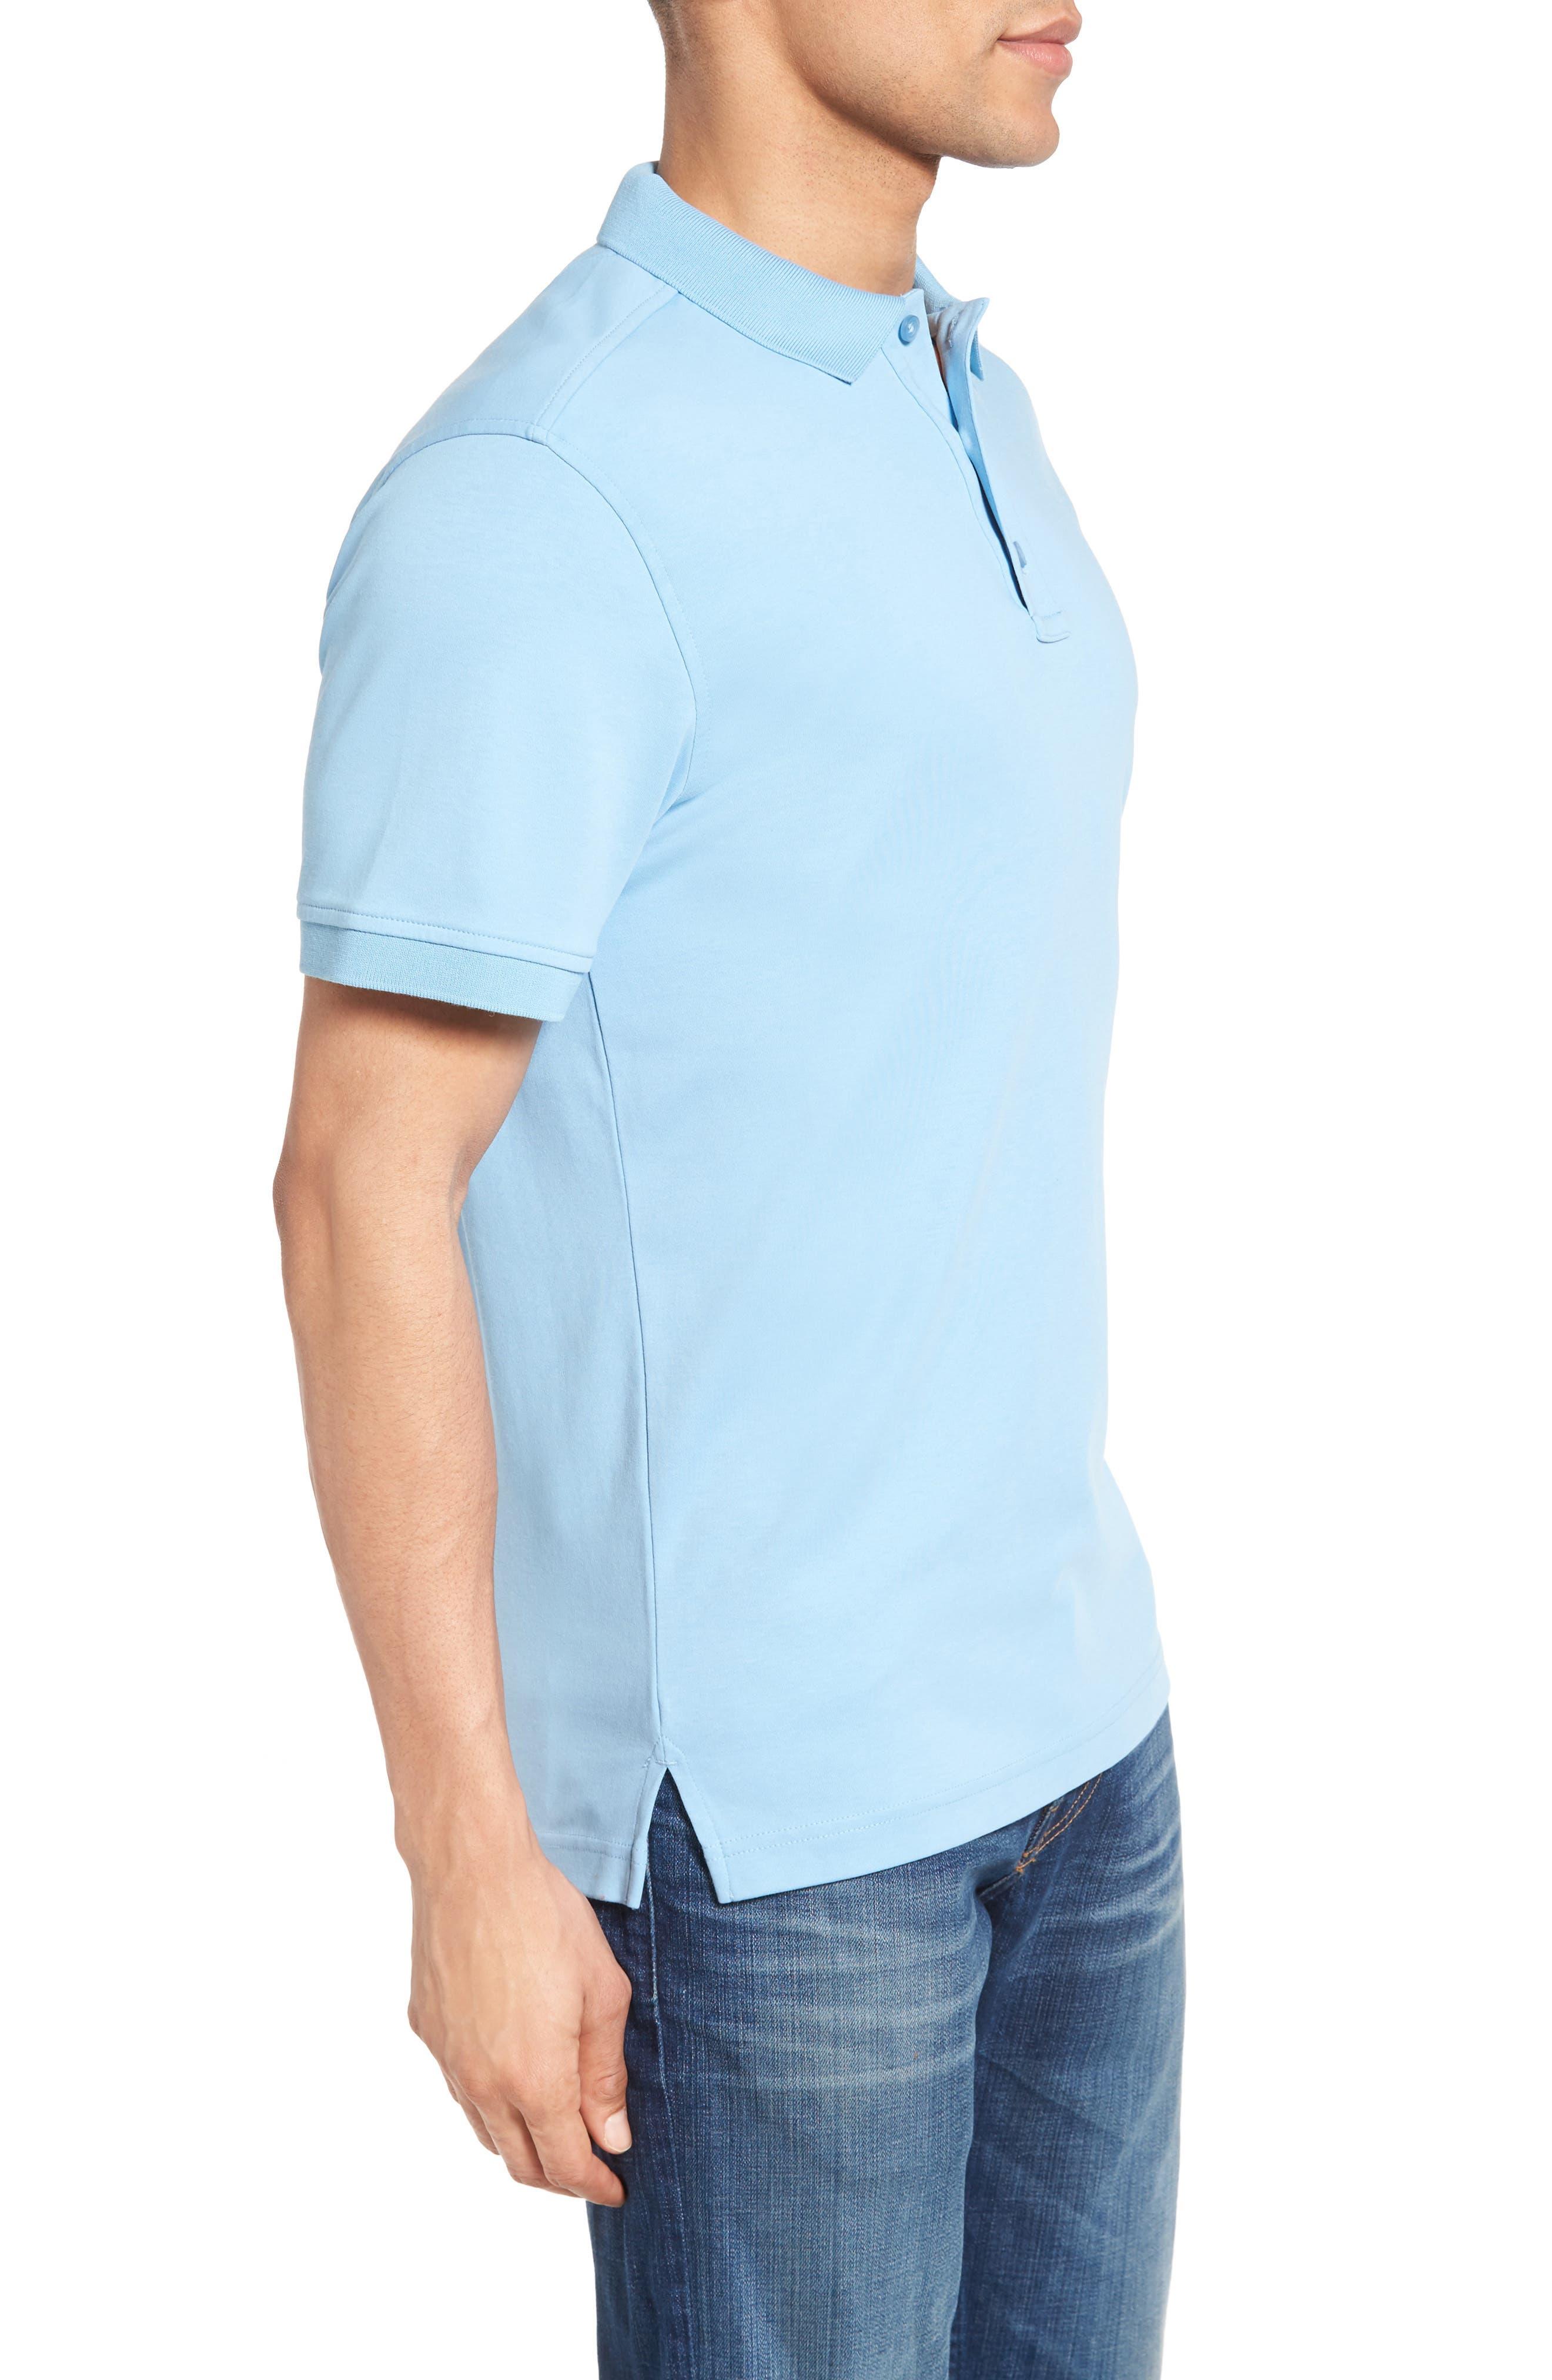 Alternate Image 3  - Nordstrom Men's Shop Slim Fit Interlock Knit Polo